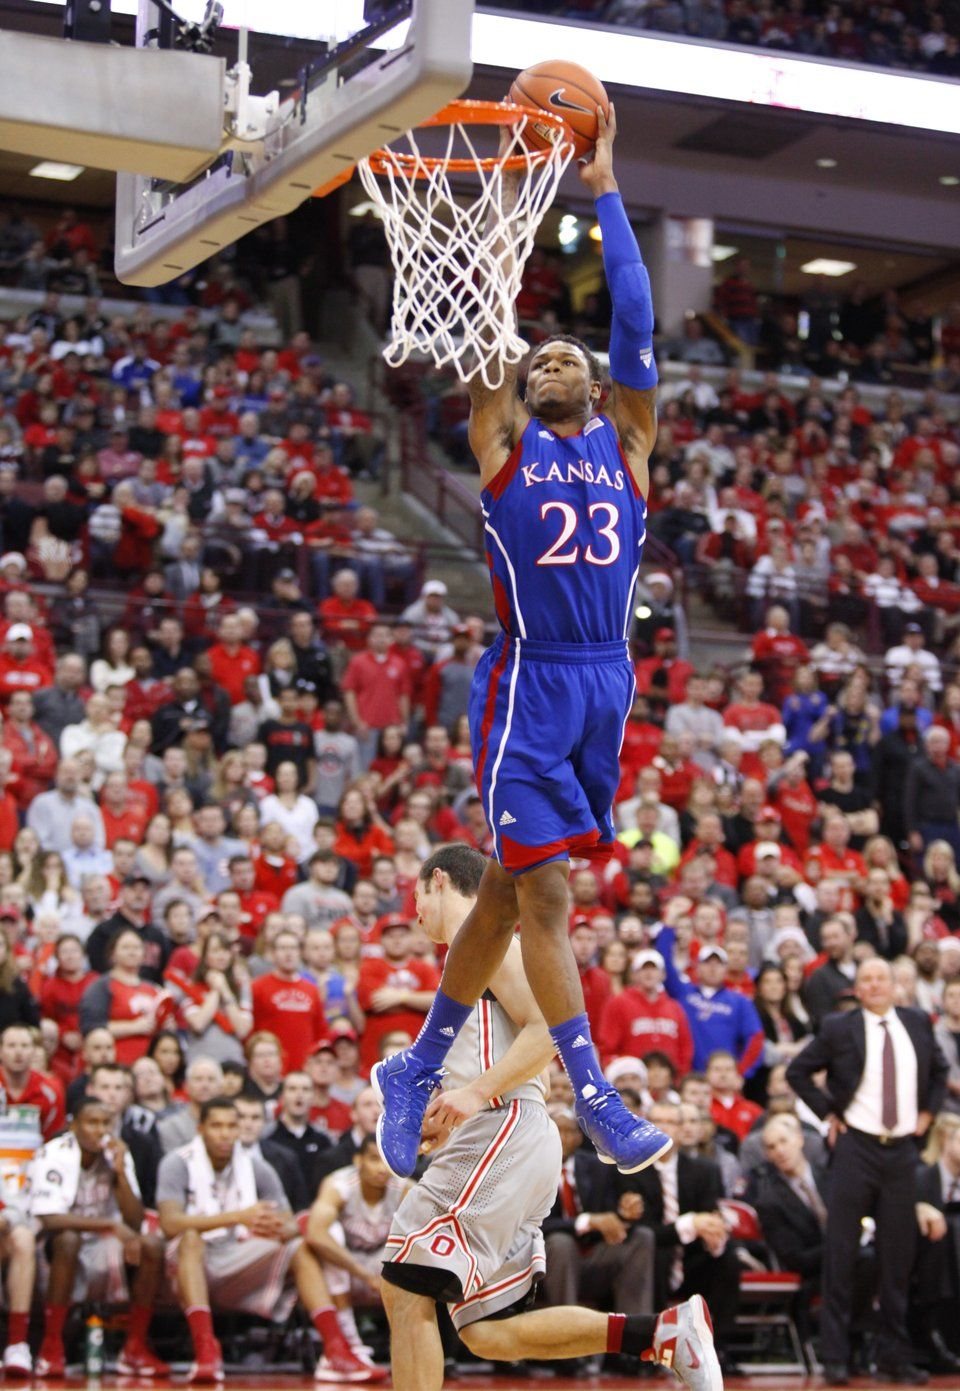 Kansas guard Ben McLemore elevates for a dunk against Ohio